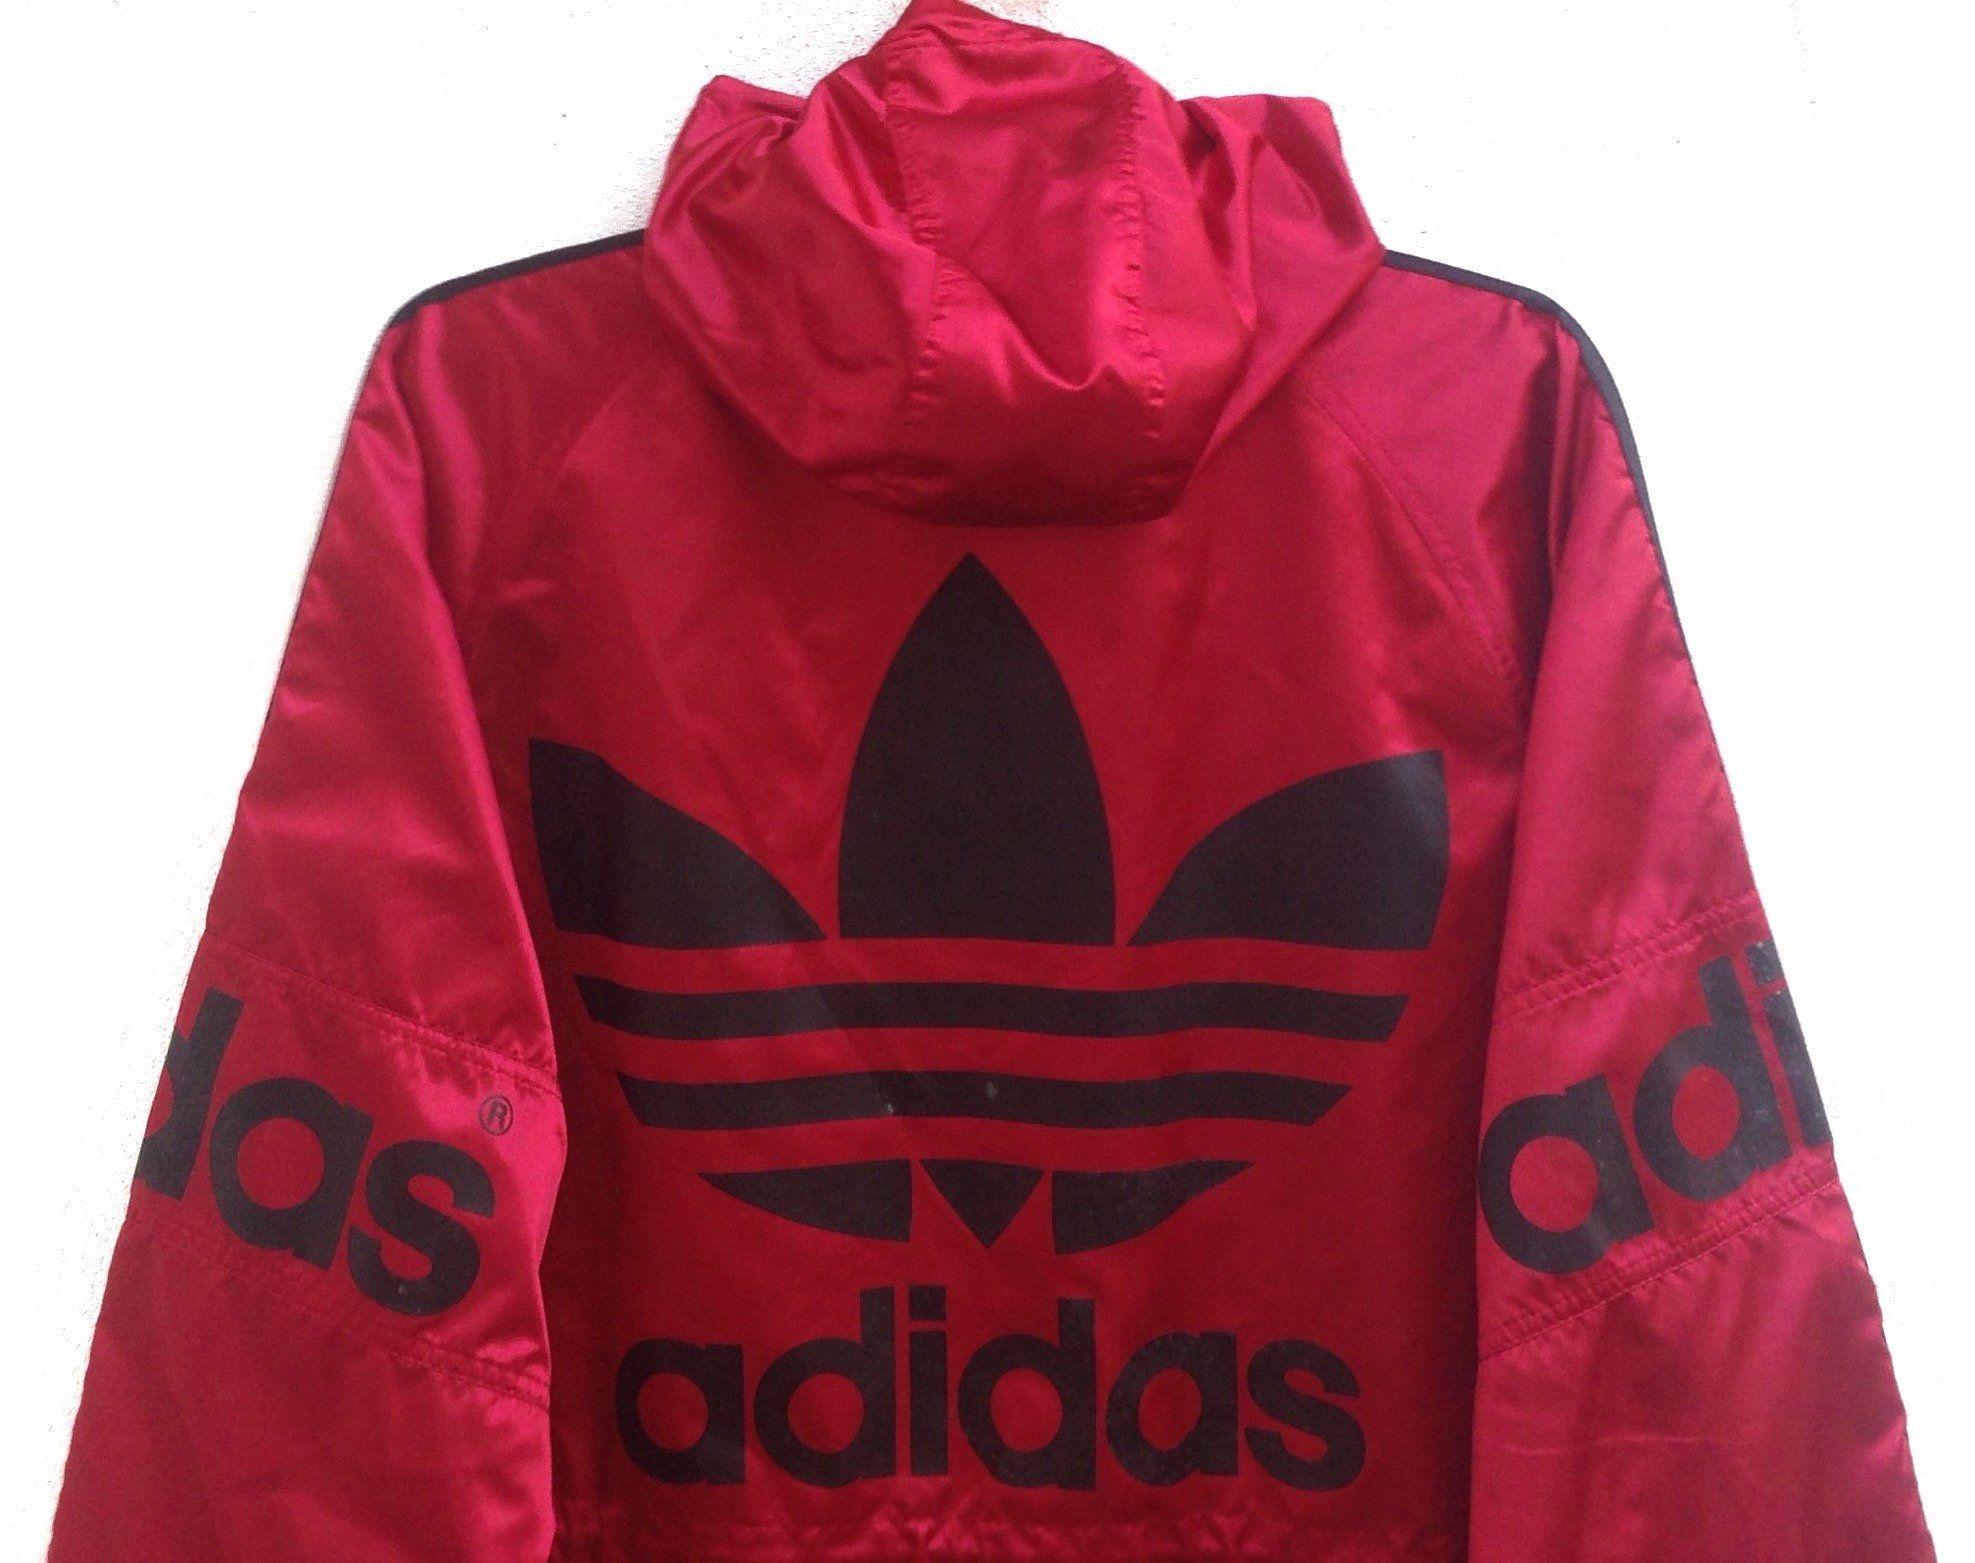 33e05e9c79d7b Vintage 90s Adidas Hoodie Jackets Adidas x Descente Windbreaker ...